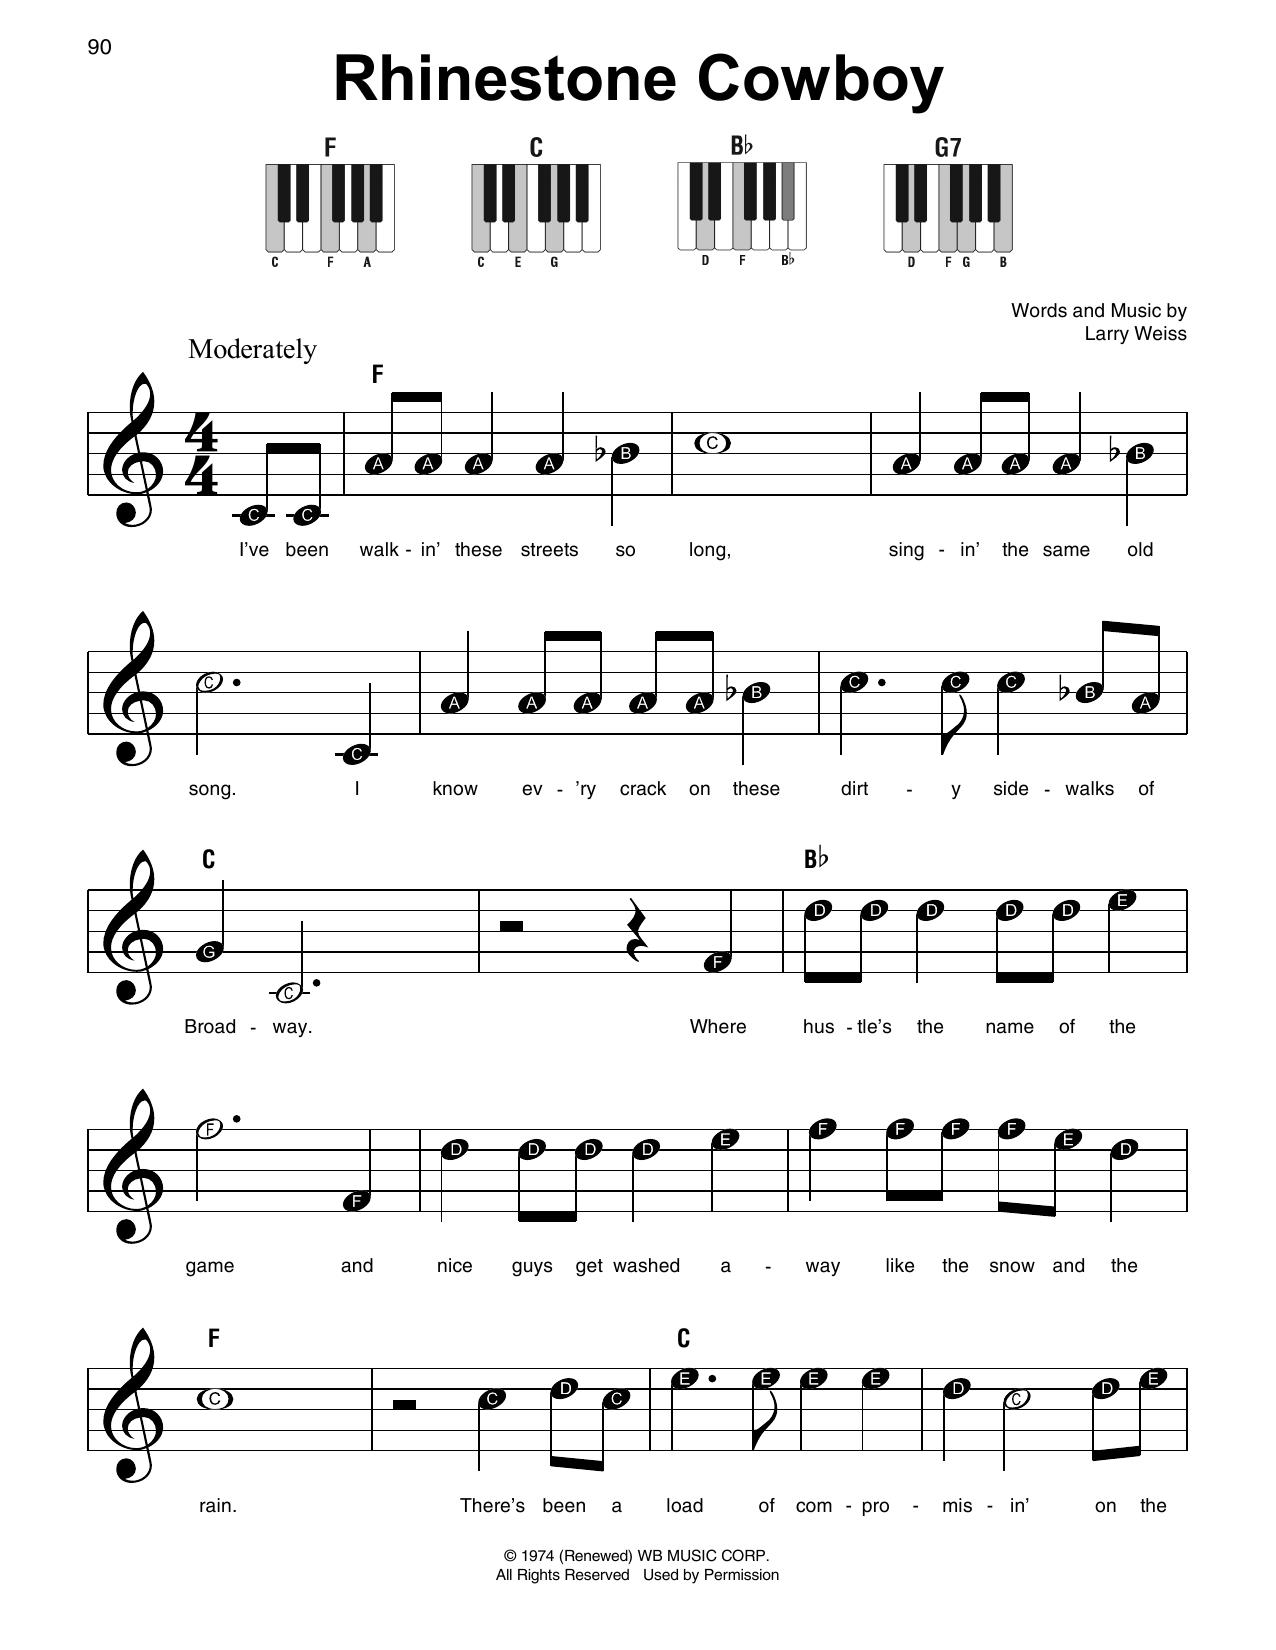 Rhinestone Cowboy (Super Easy Piano)